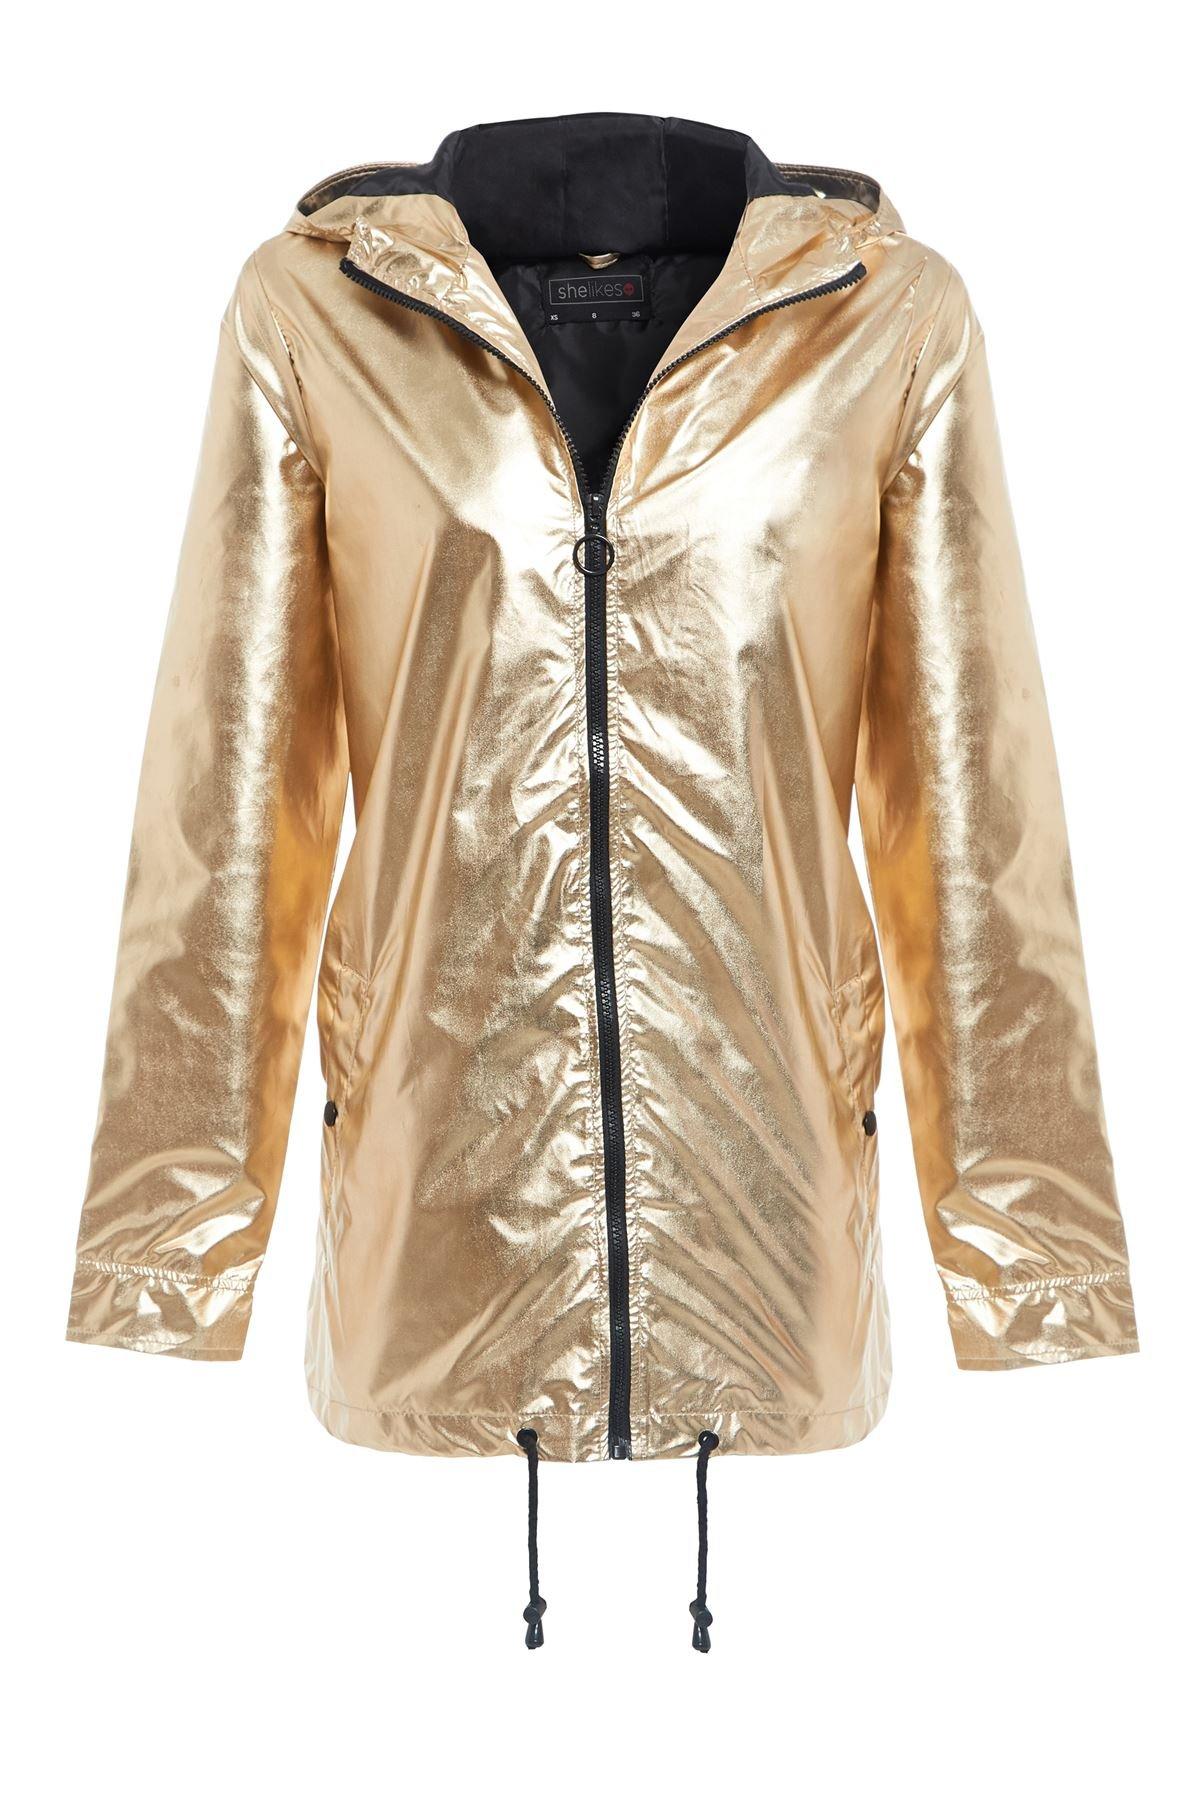 Womens Hooded Zipped Metallic Festival Jacket Top Raincoat Kagool Mac-Gold-8